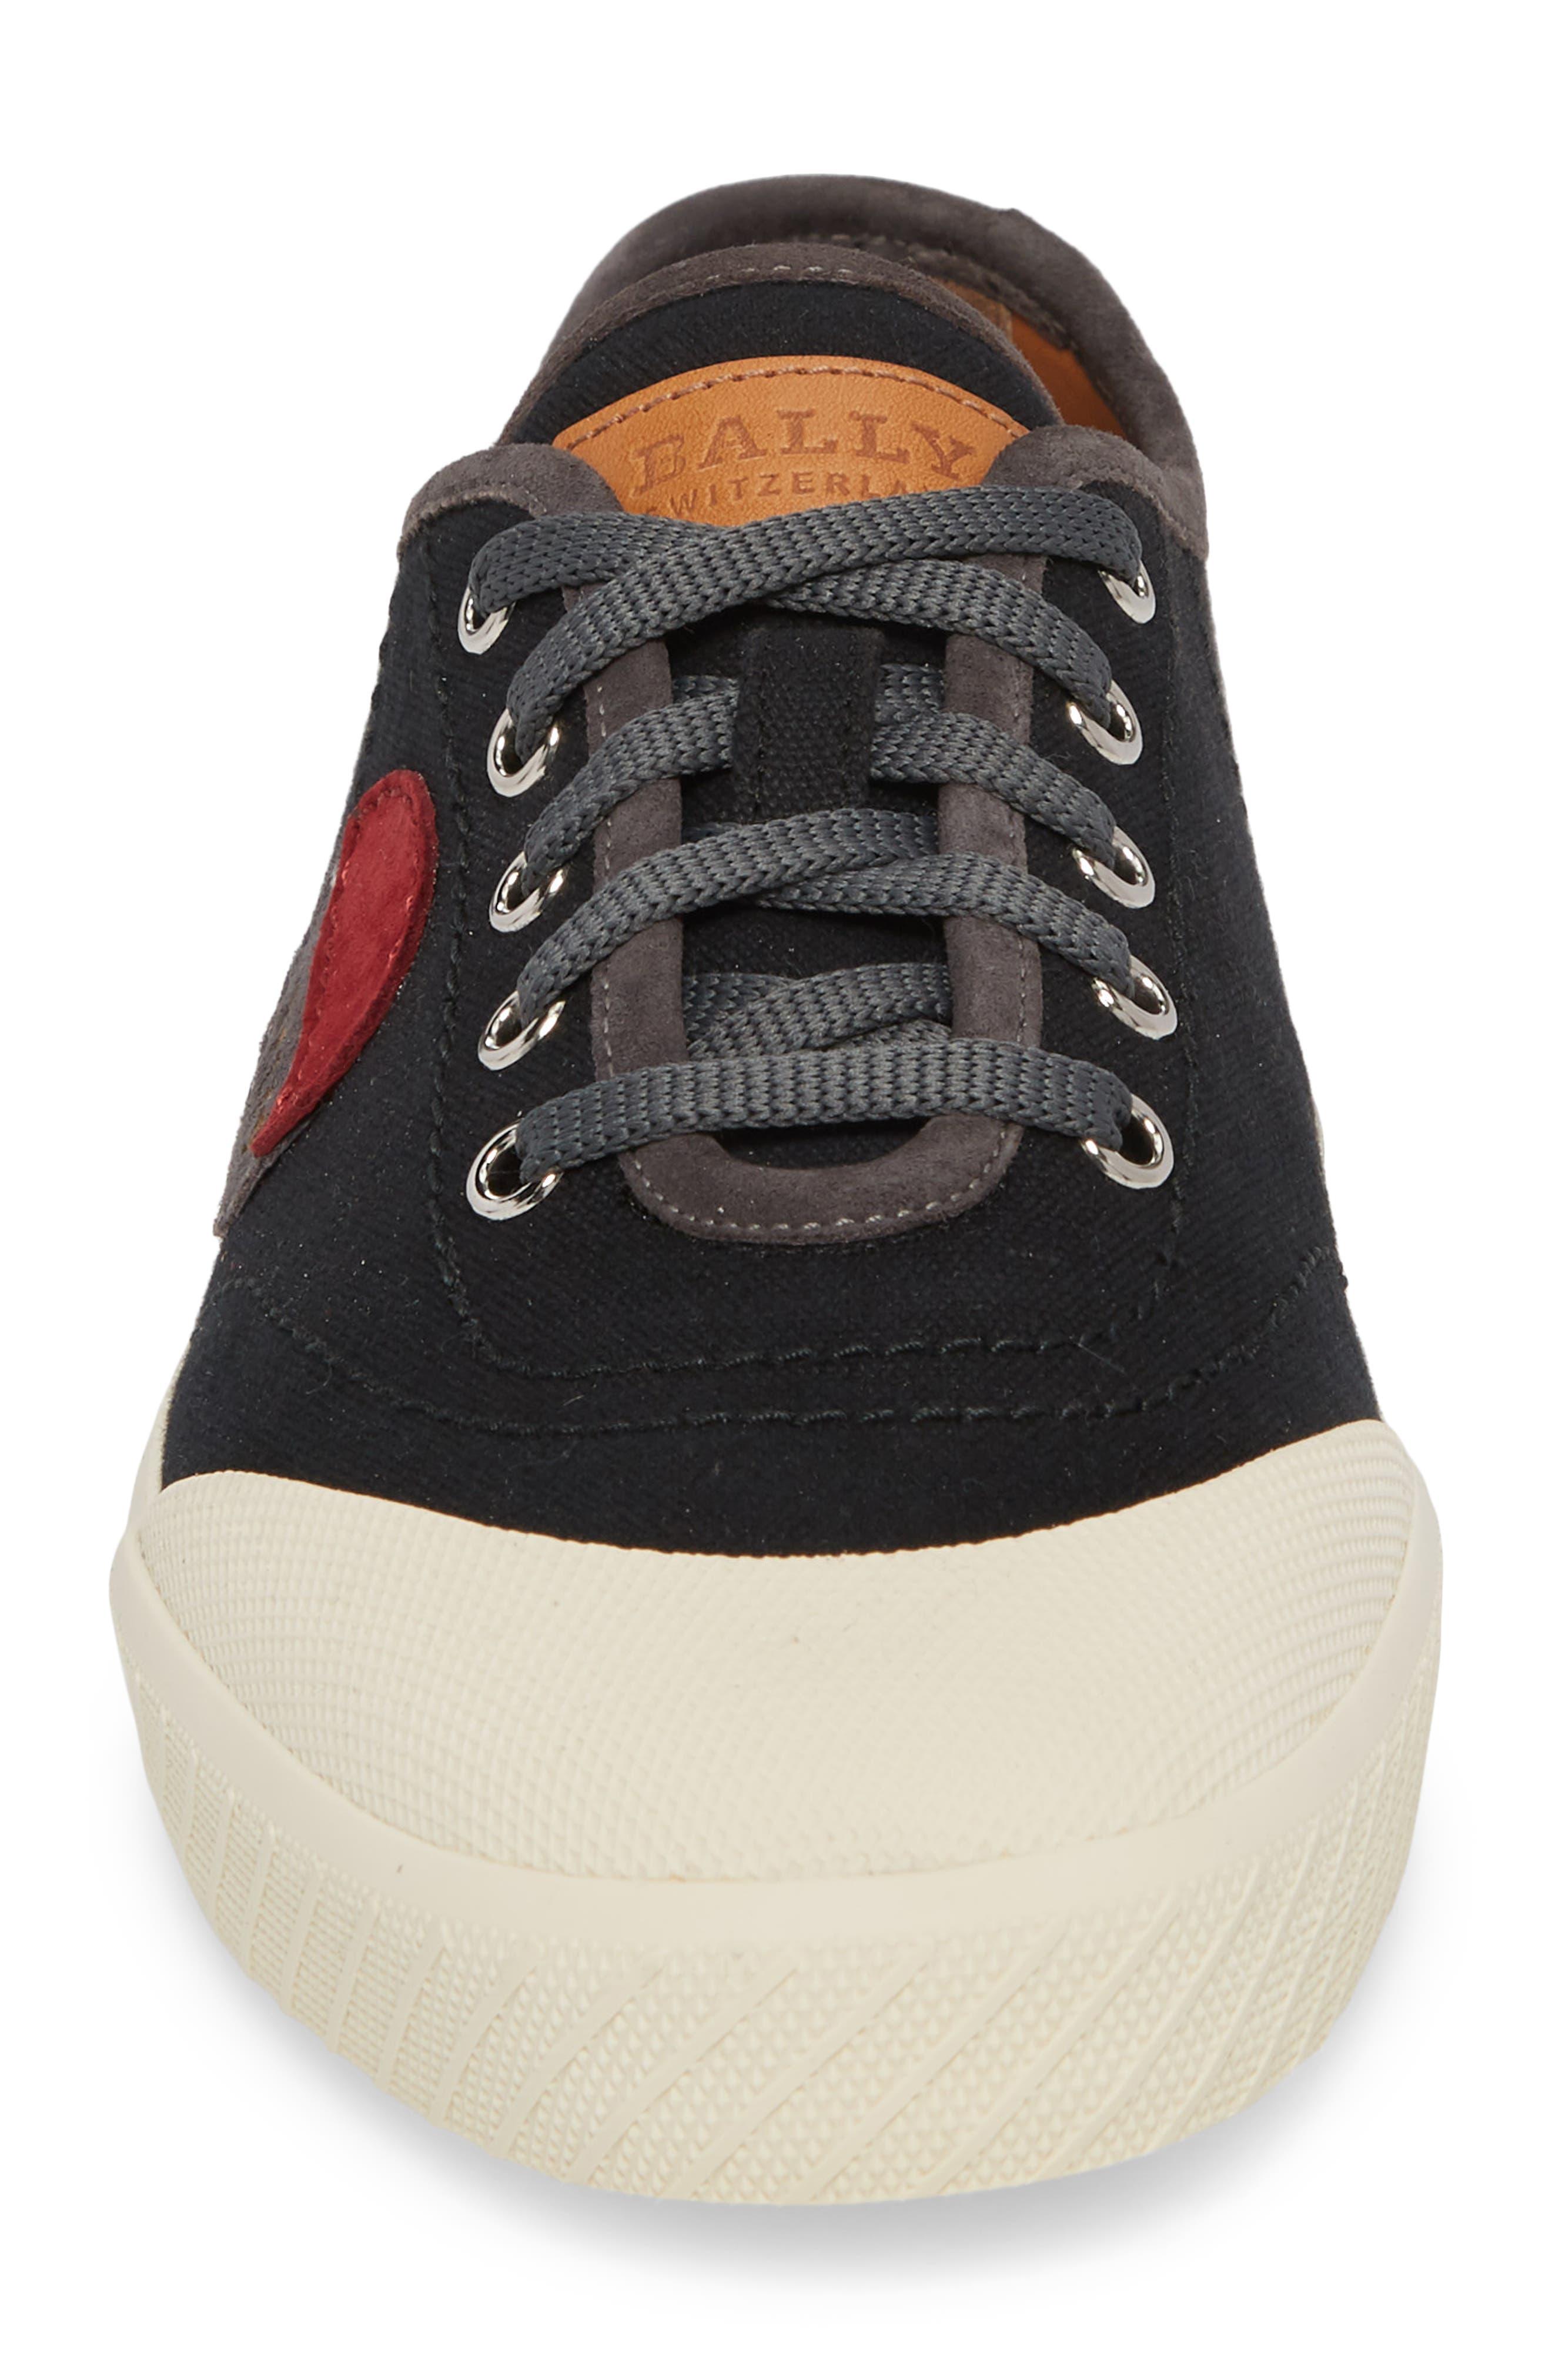 Silio Low Top Sneaker,                             Alternate thumbnail 4, color,                             001